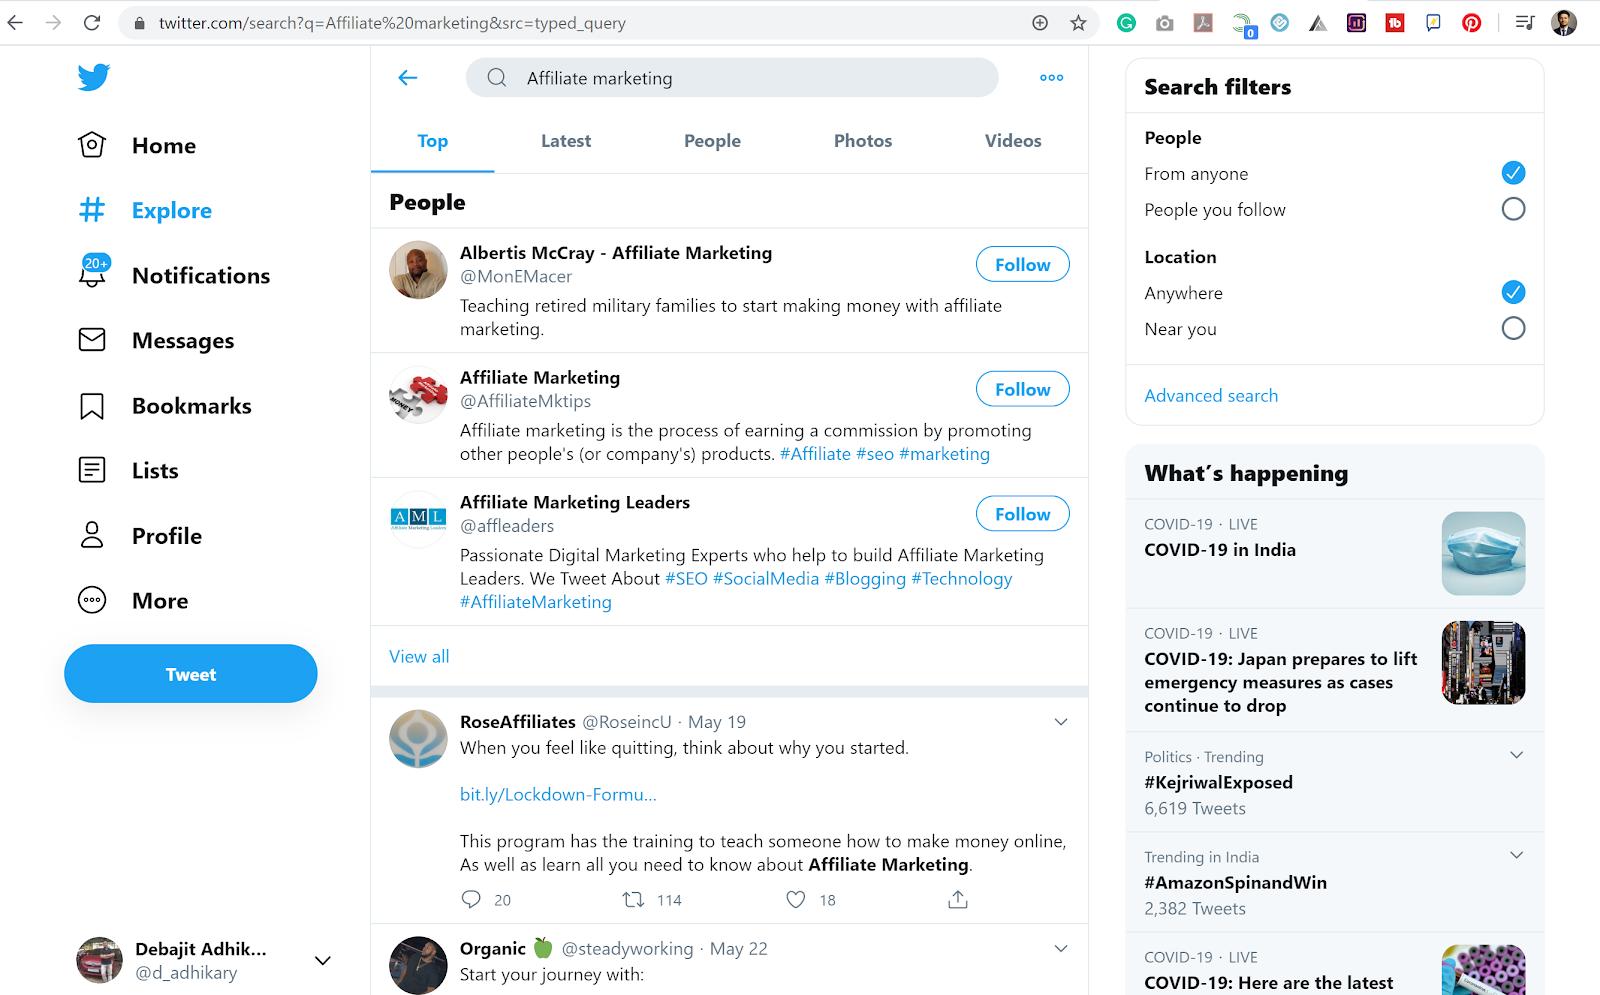 Blog Post Content Ideas - Twitter